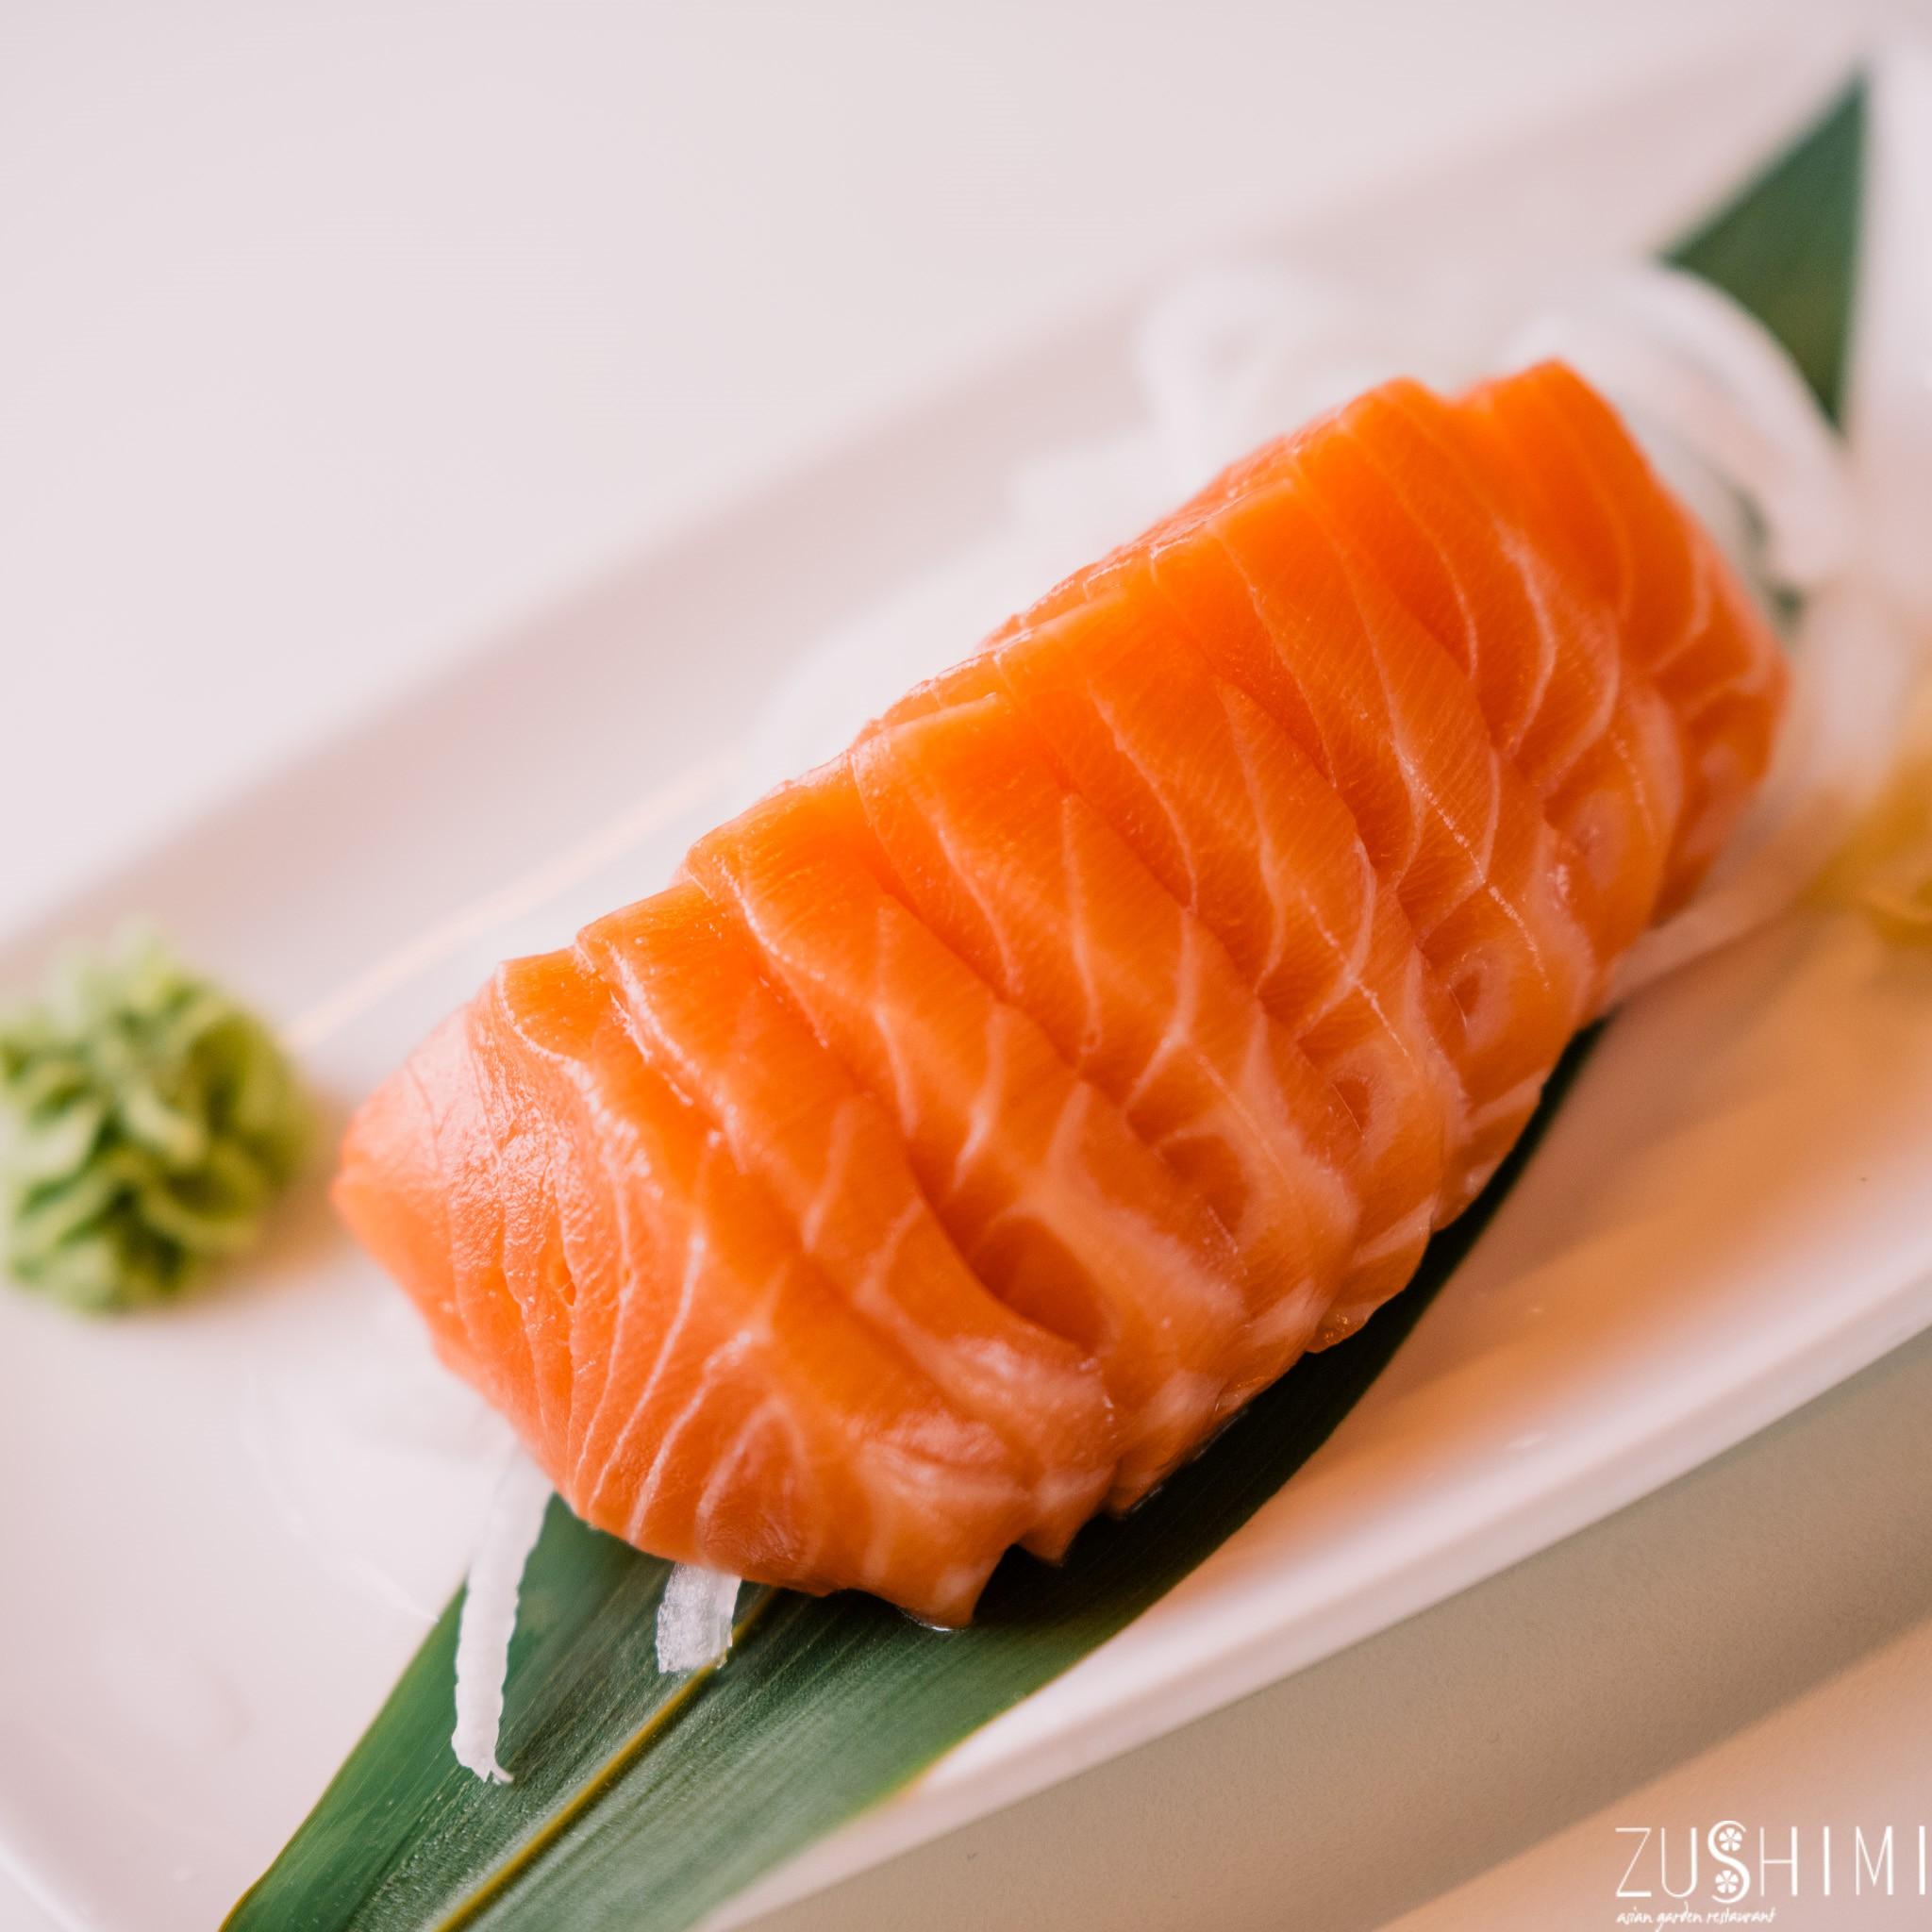 zushimi sashimi salmone